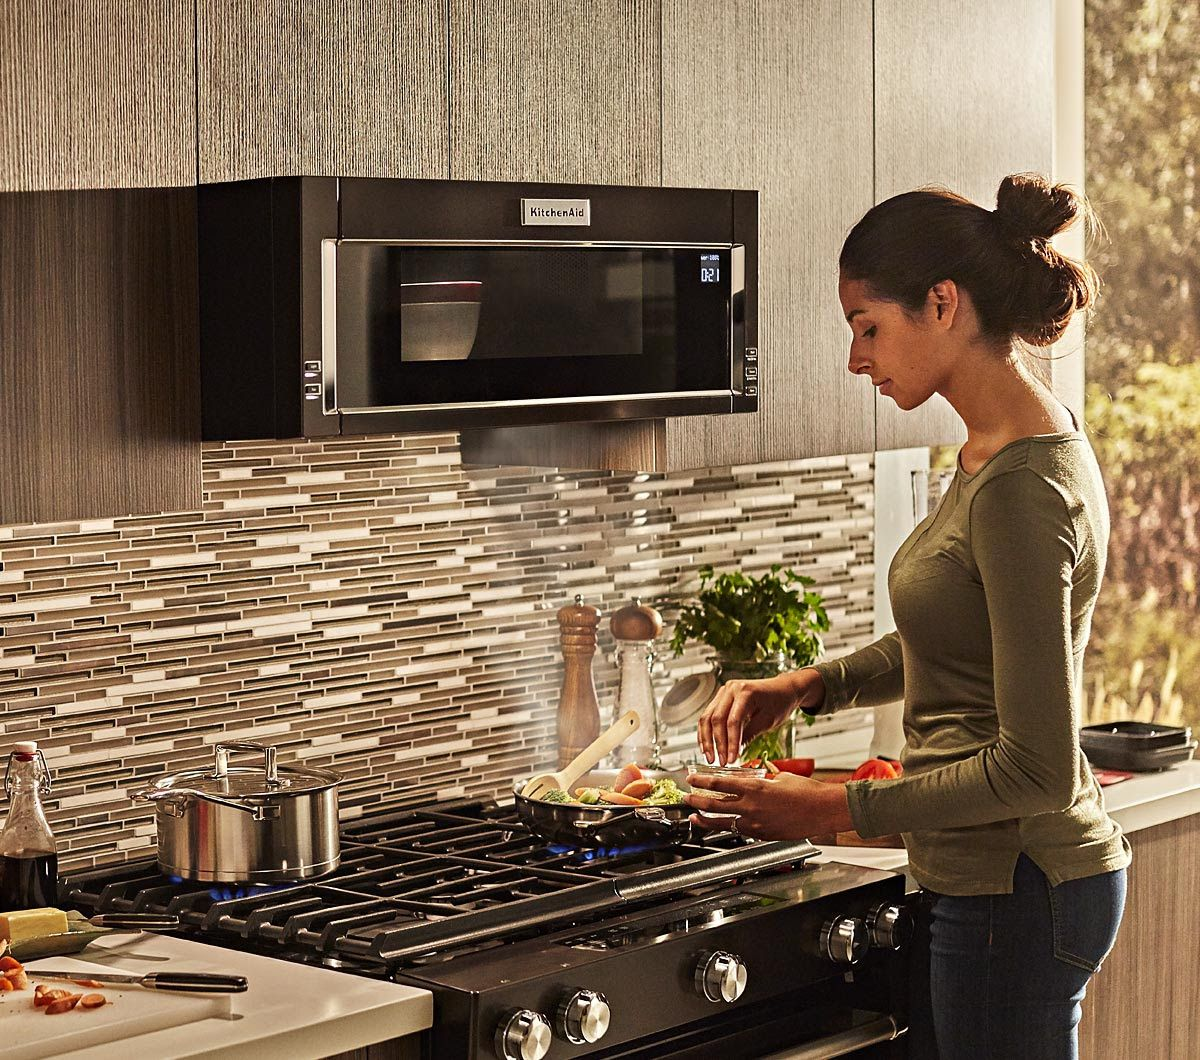 Kitchenaid Low Profile Microwave And Hood Combination Microwave Hood Microwave In Kitchen Kitchen Aid